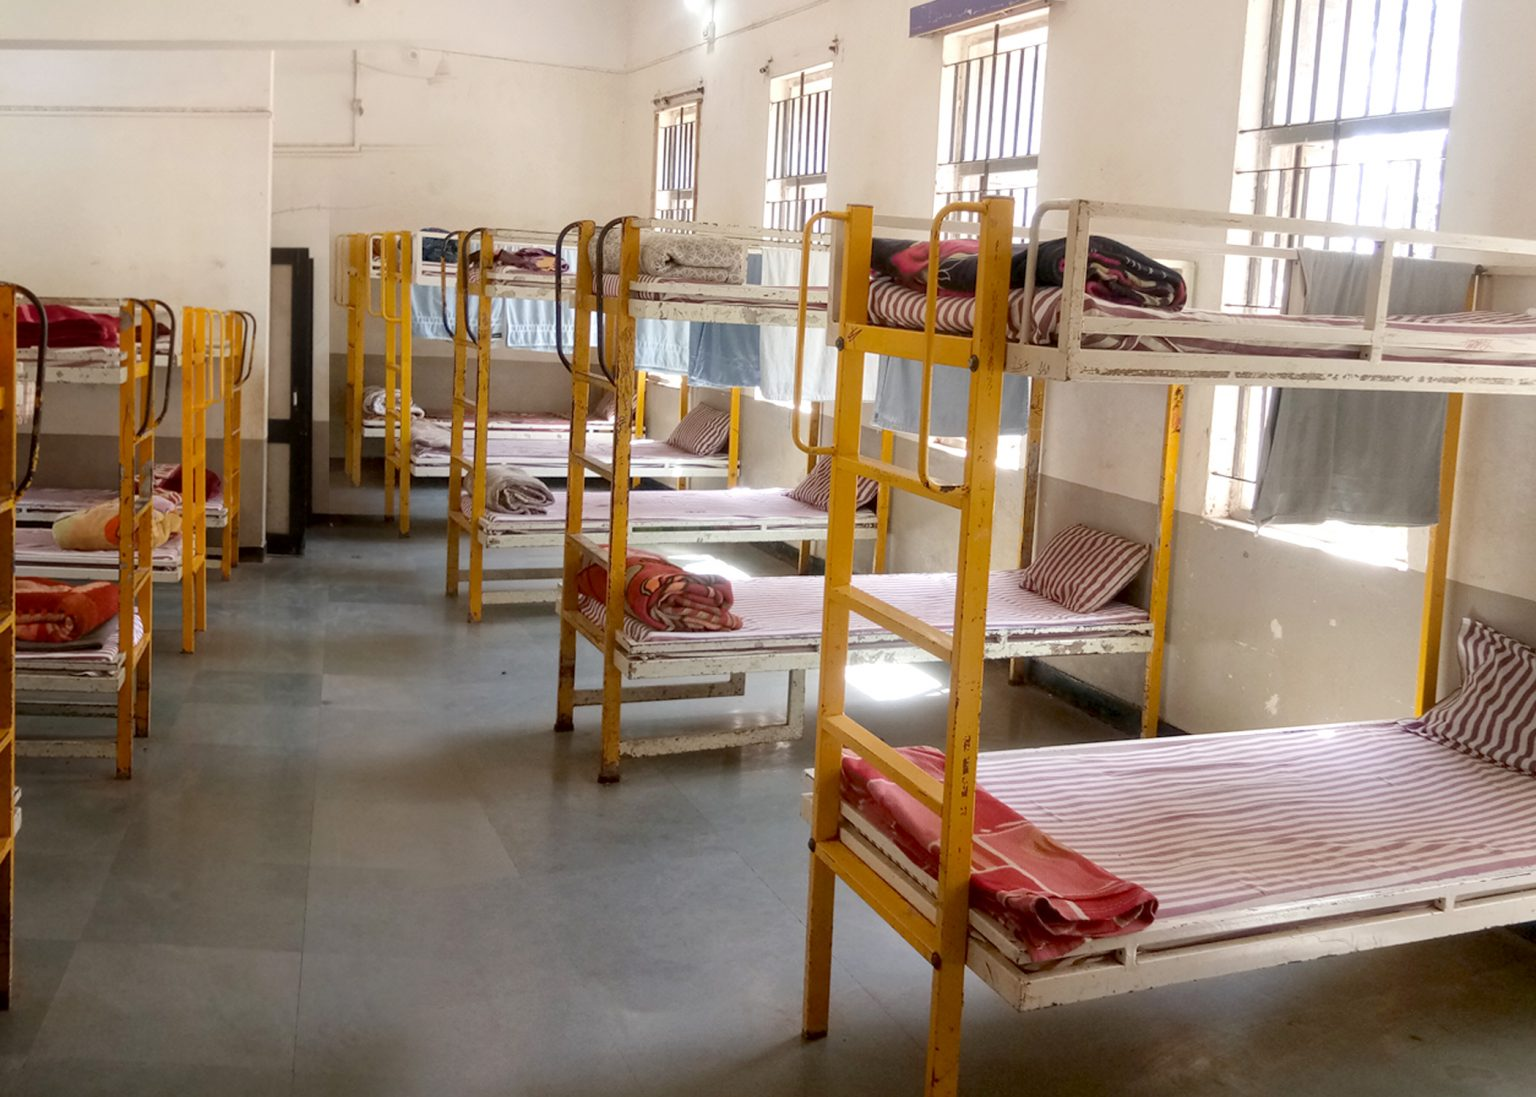 hostel1-1536x1097